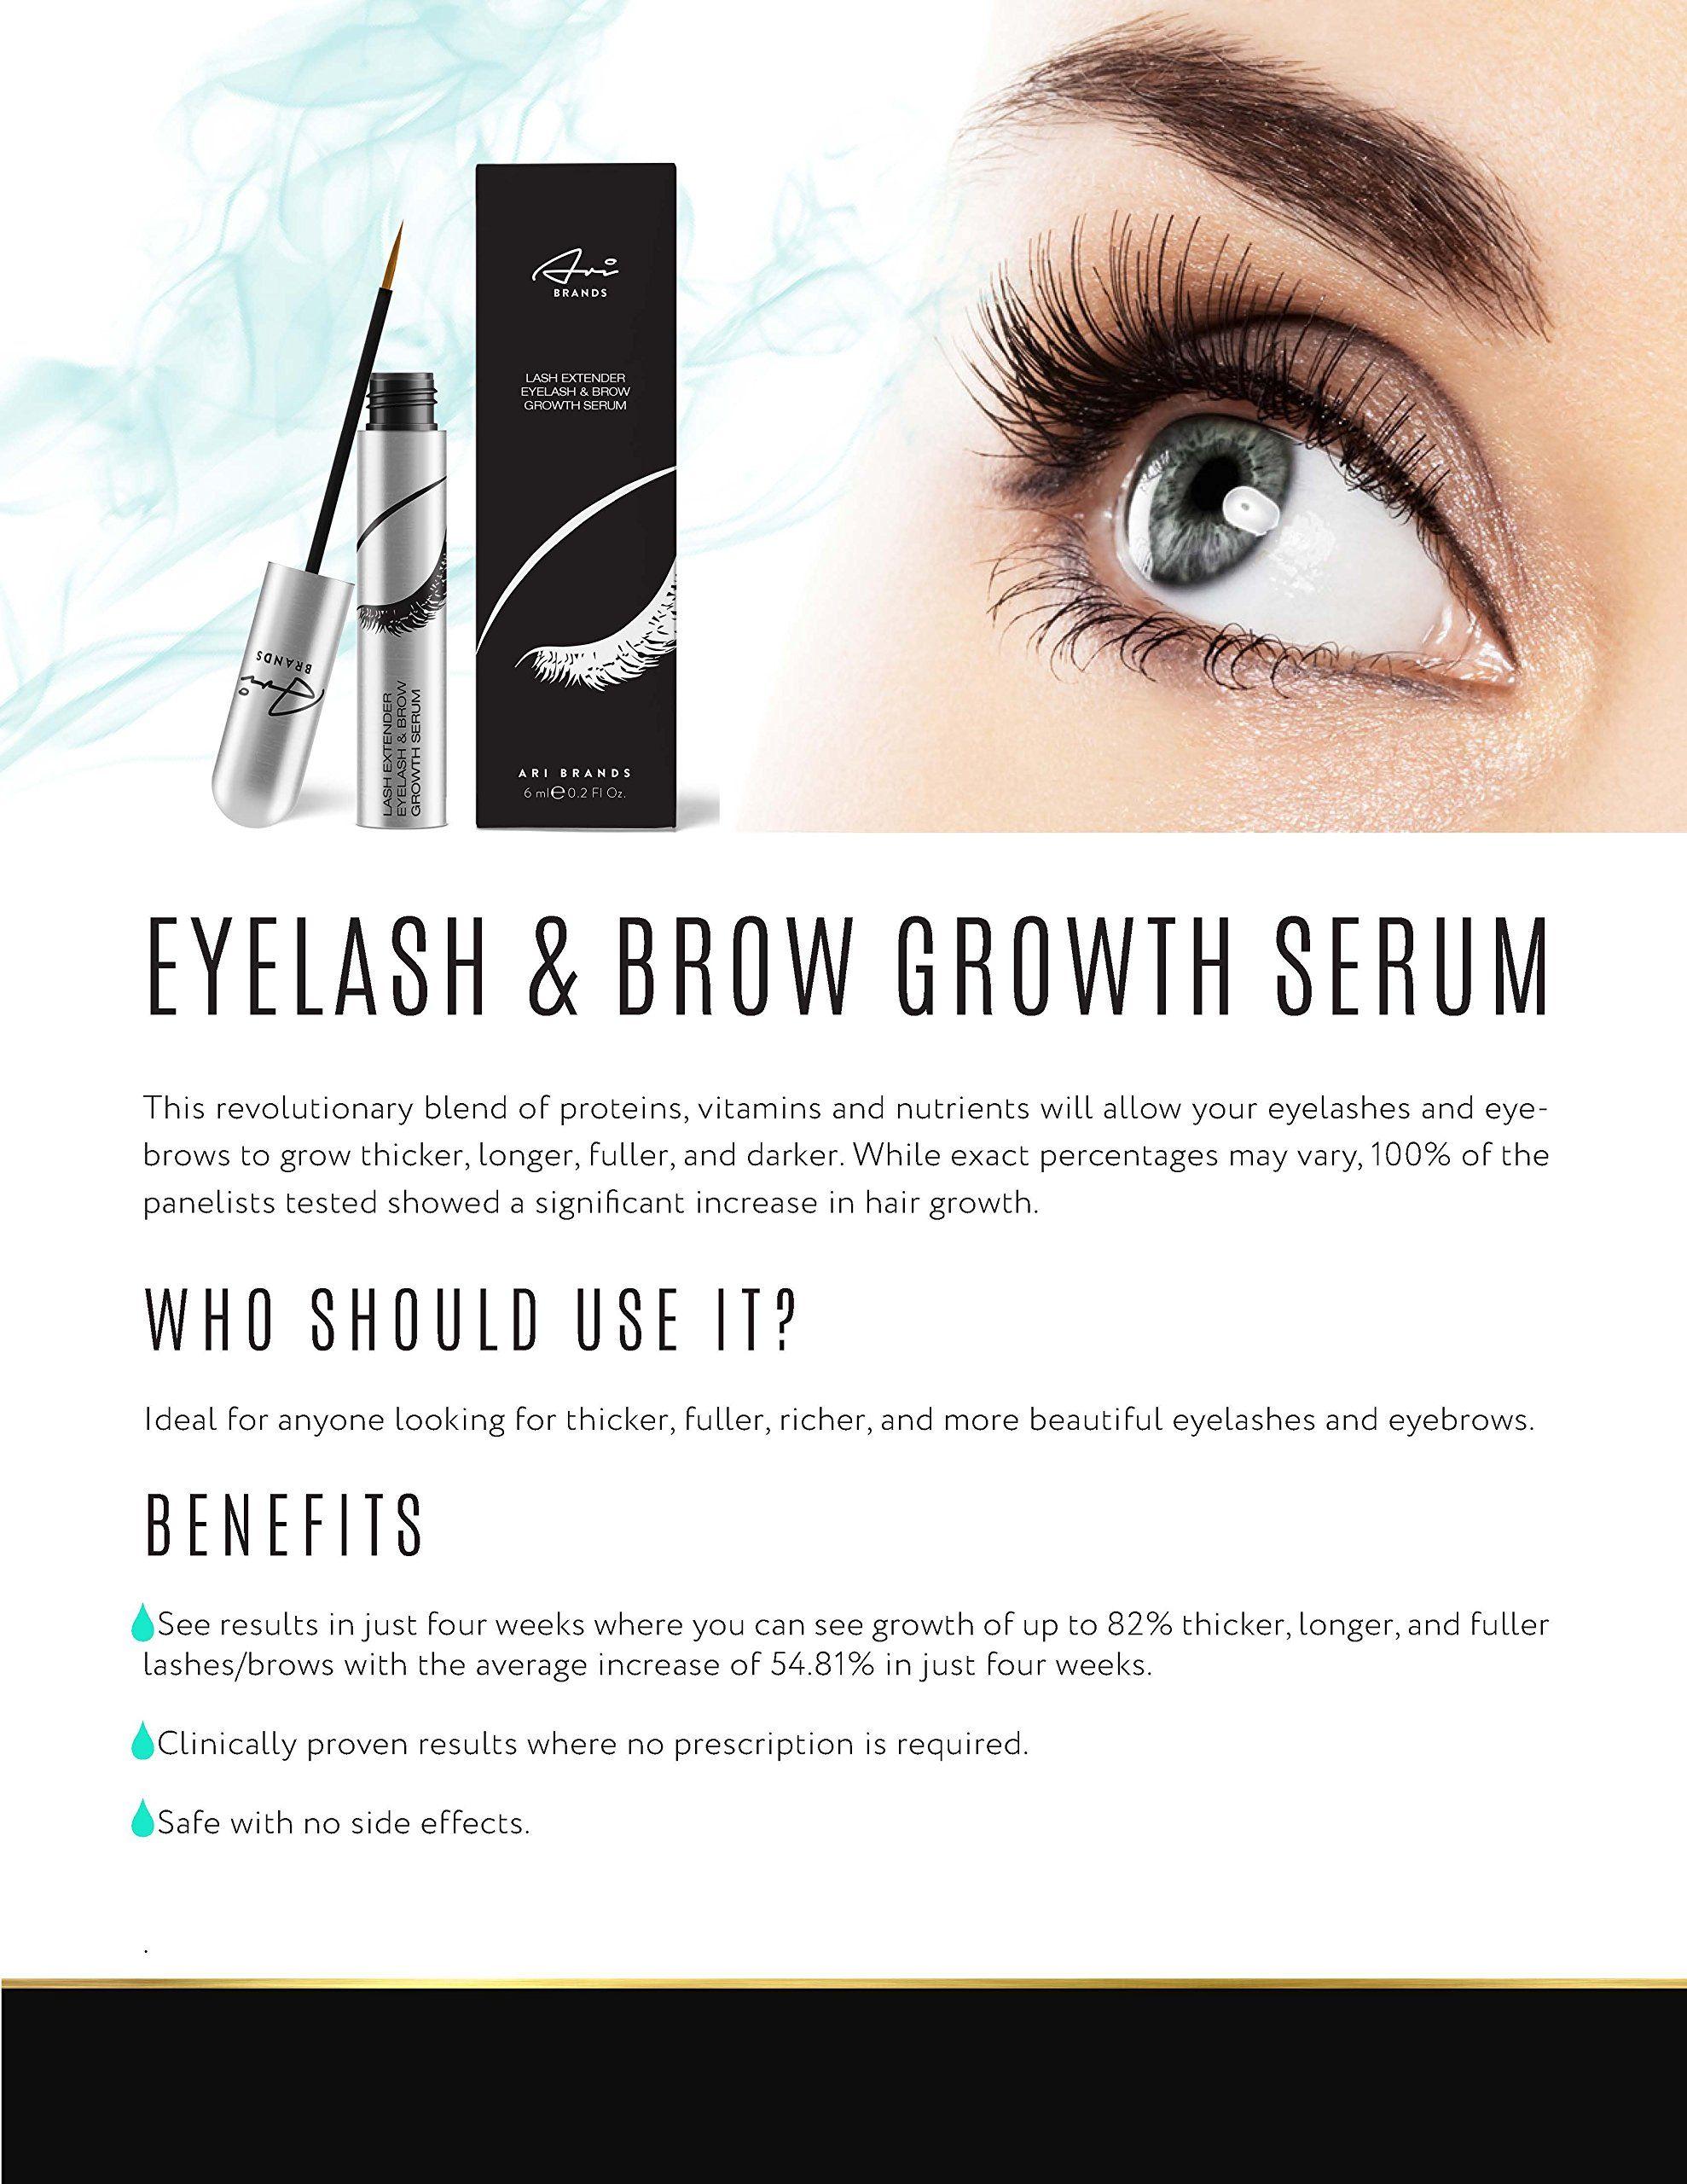 989d8881c2f Ari Brands BEST Eyelash and Eyebrow Growth Serum Clinically Proven Eyelash  Enhancing Natural Conditioner Serum for